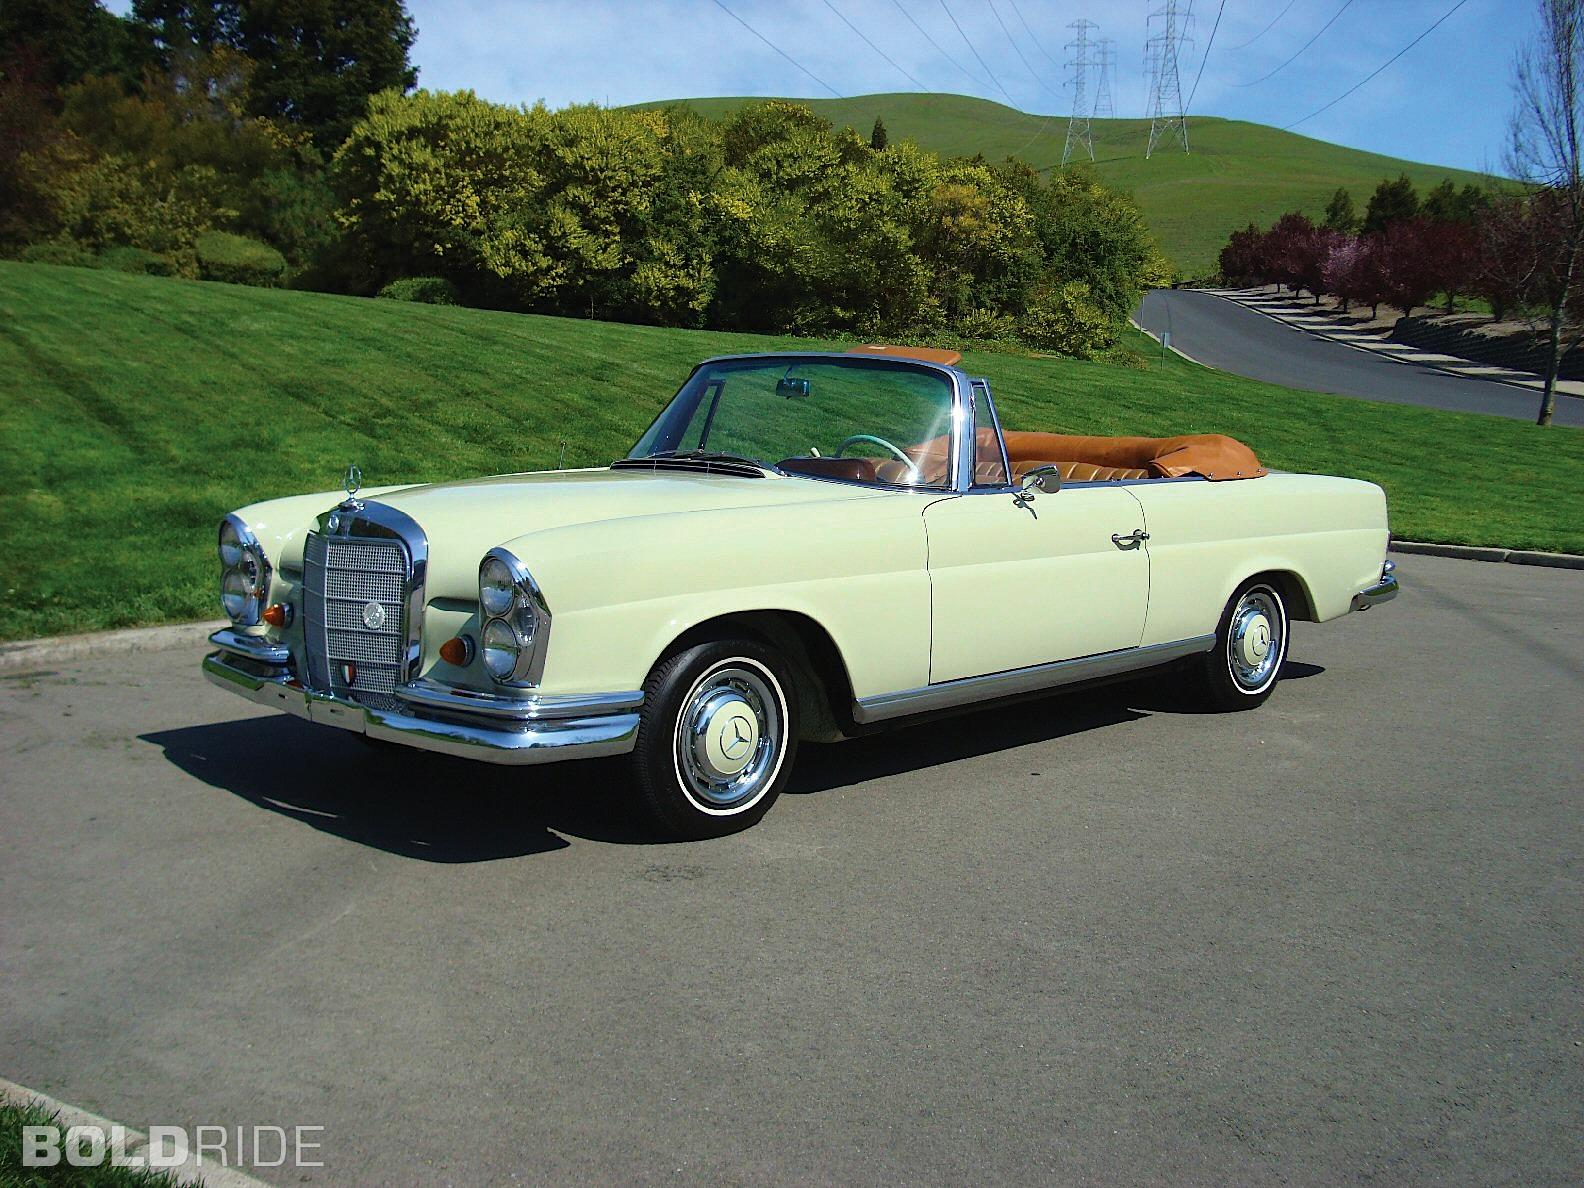 mercedes benz 220 se picture 13 reviews news specs buy car. Black Bedroom Furniture Sets. Home Design Ideas